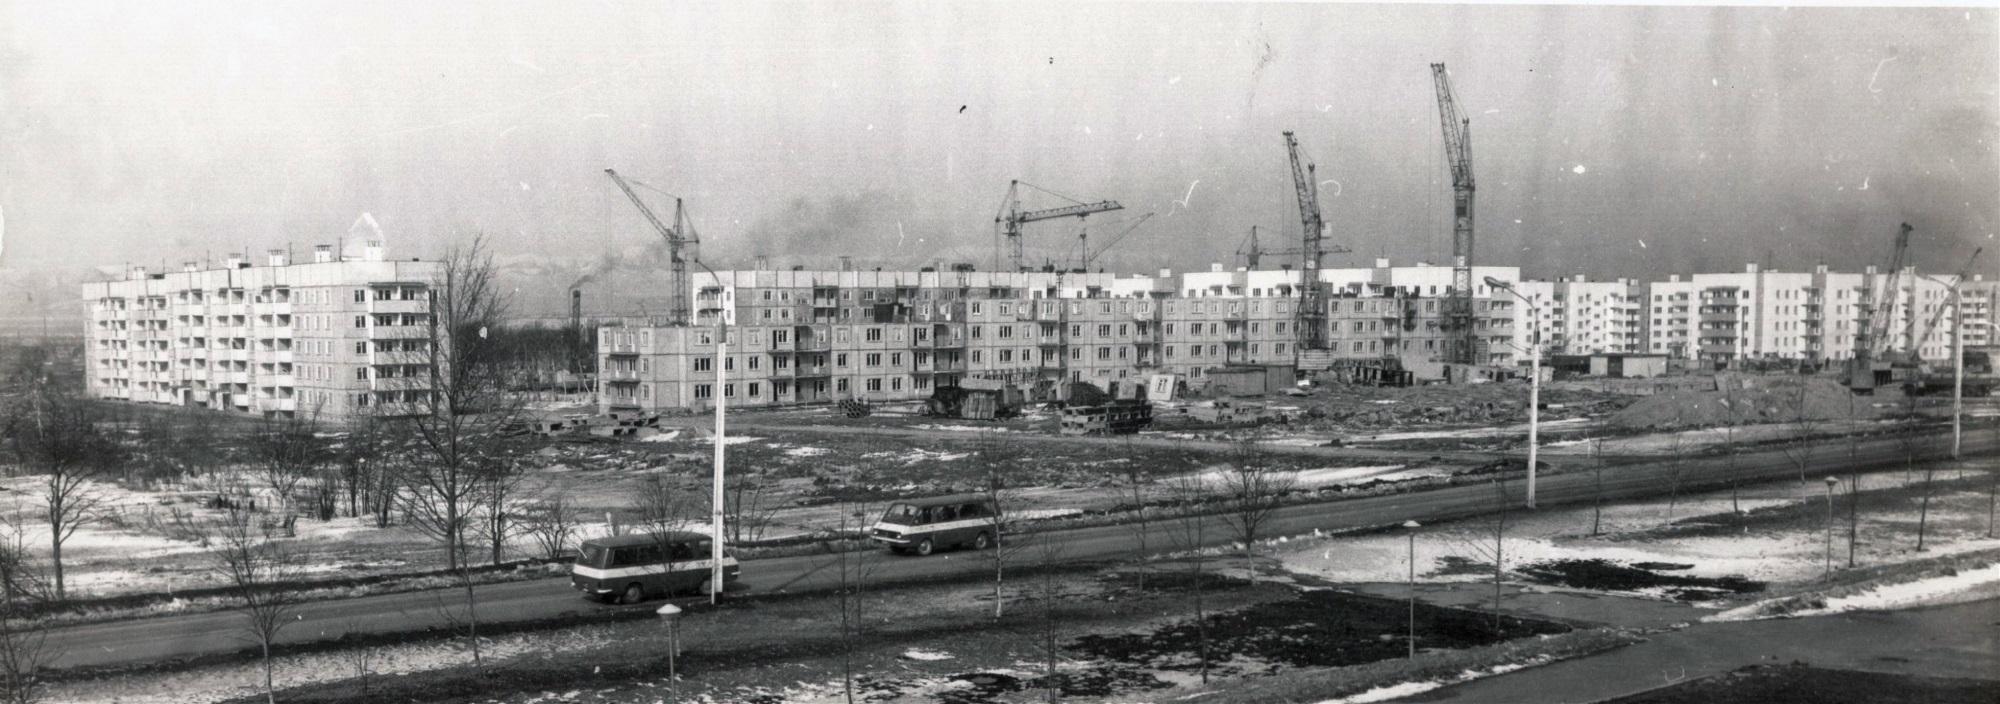 Строительство 11 микрорайона в г. Южно-Сахалинске